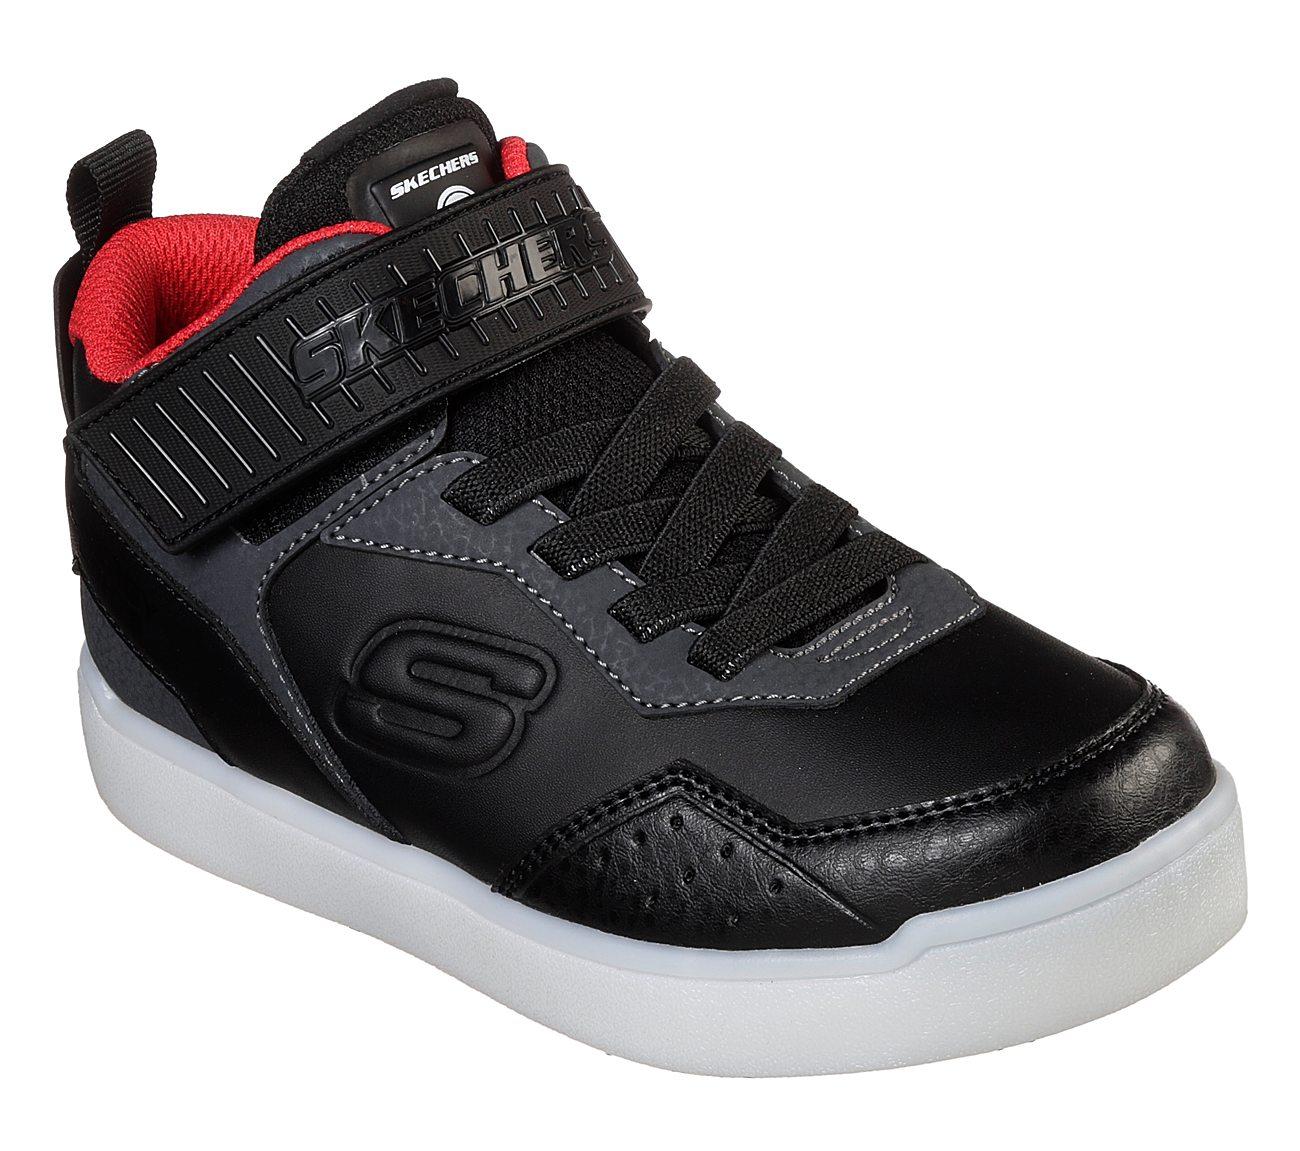 6b1717ebbd73 Buy SKECHERS S Lights  Energy Lights - Merrox Energy Lights Shoes only   57.00